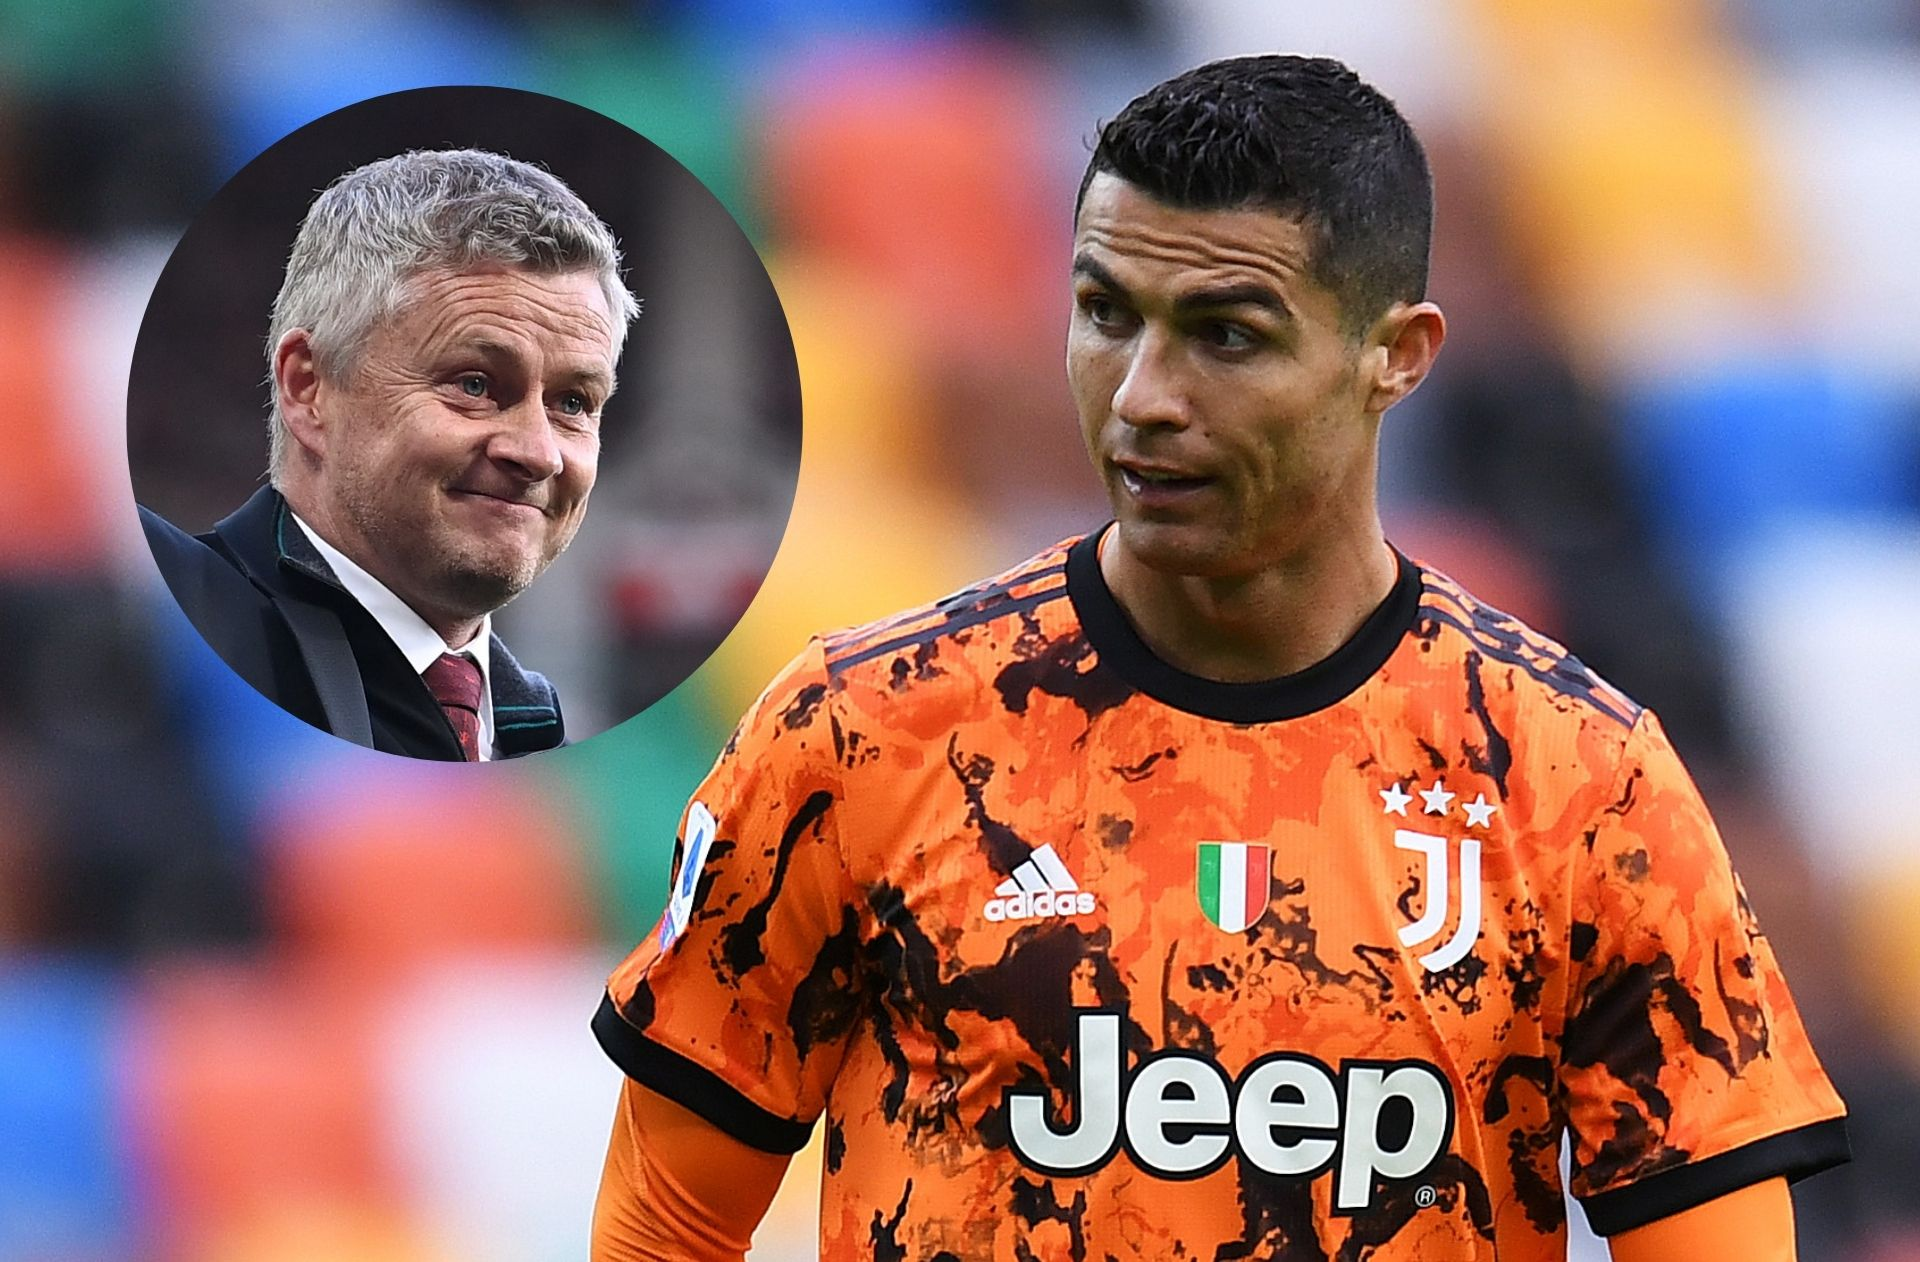 Solskjaer - Man United, Ronaldo - Juventus